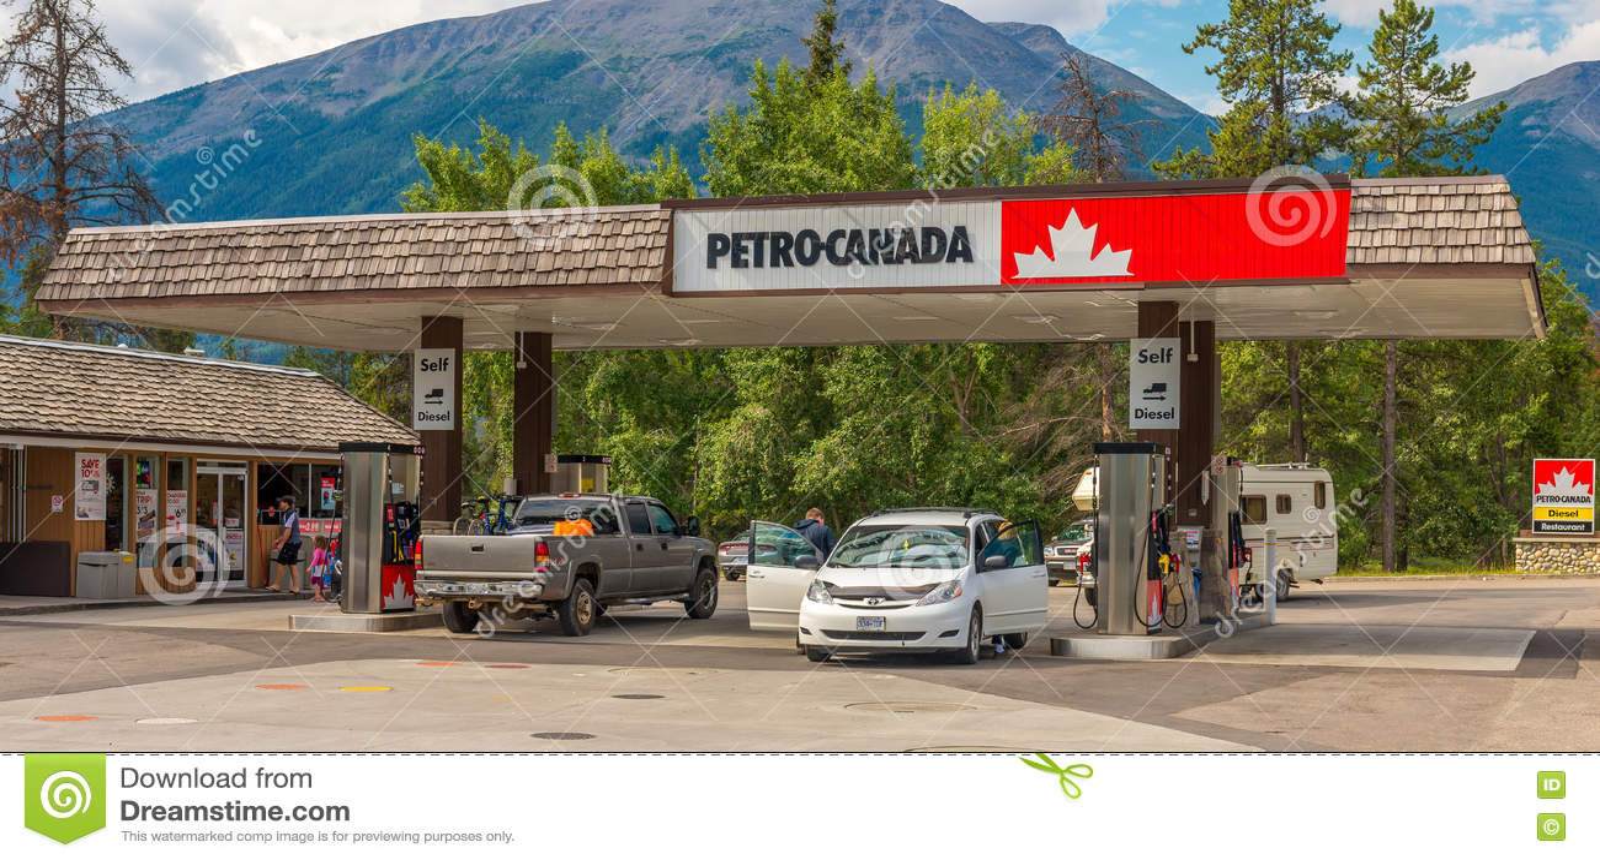 Petro Canada Jasper National Park